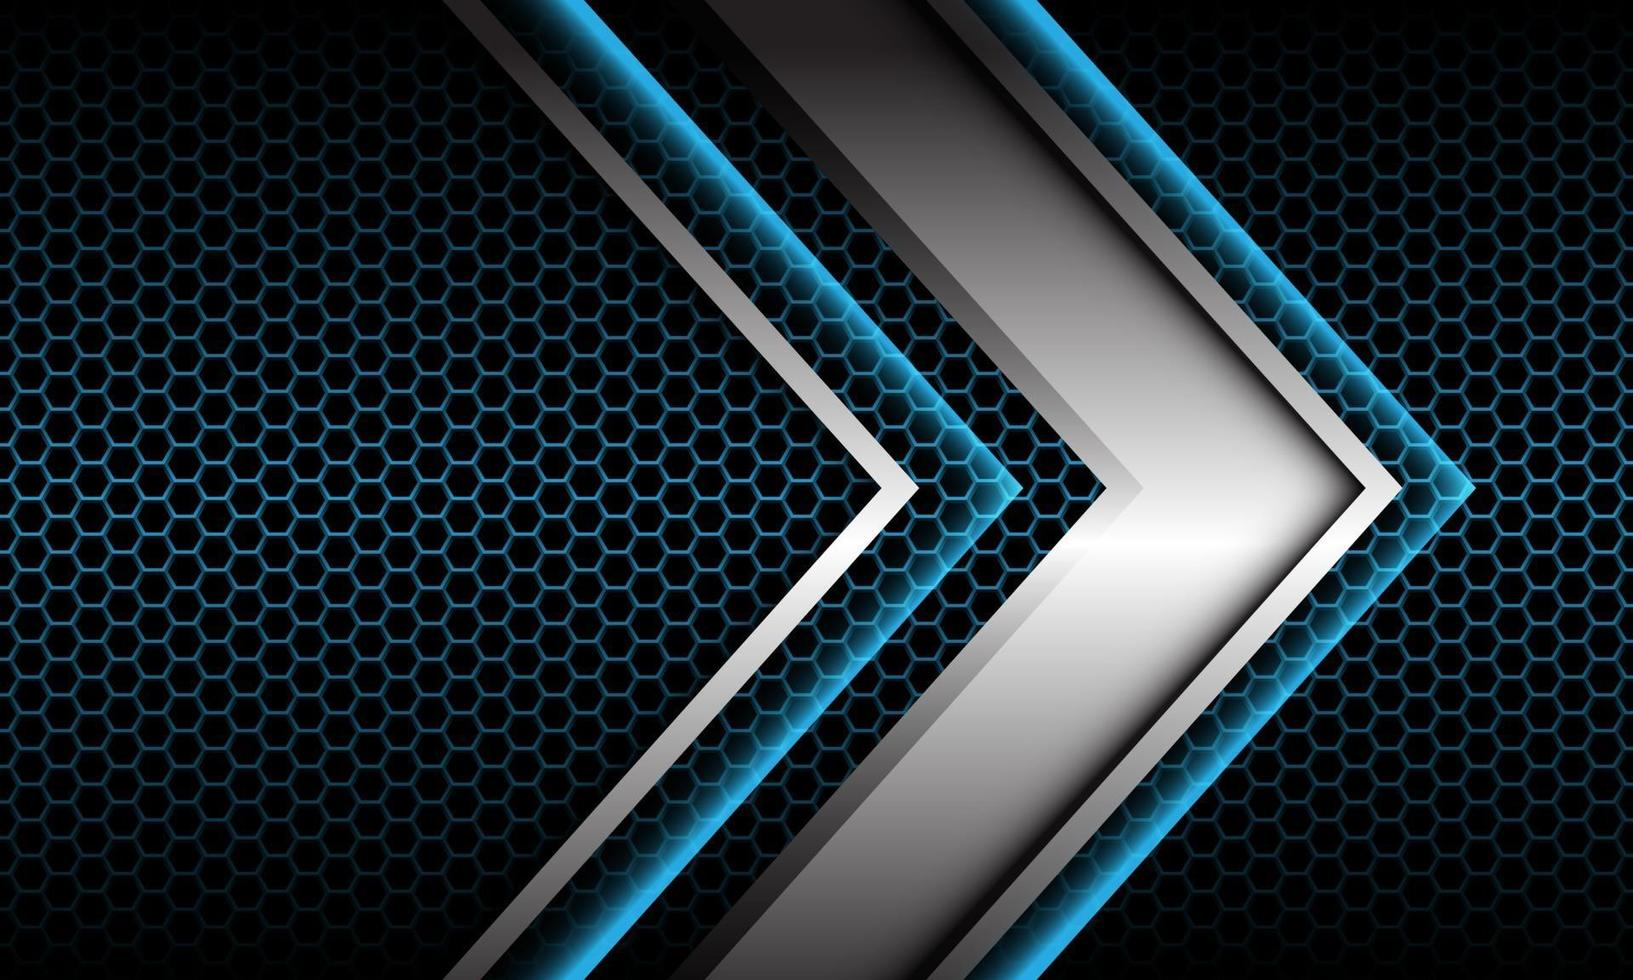 abstrakt silver pil skugga metallisk riktning geometrisk på blå hexagon mesh mönster design modern futuristisk bakgrund vektorillustration. vektor